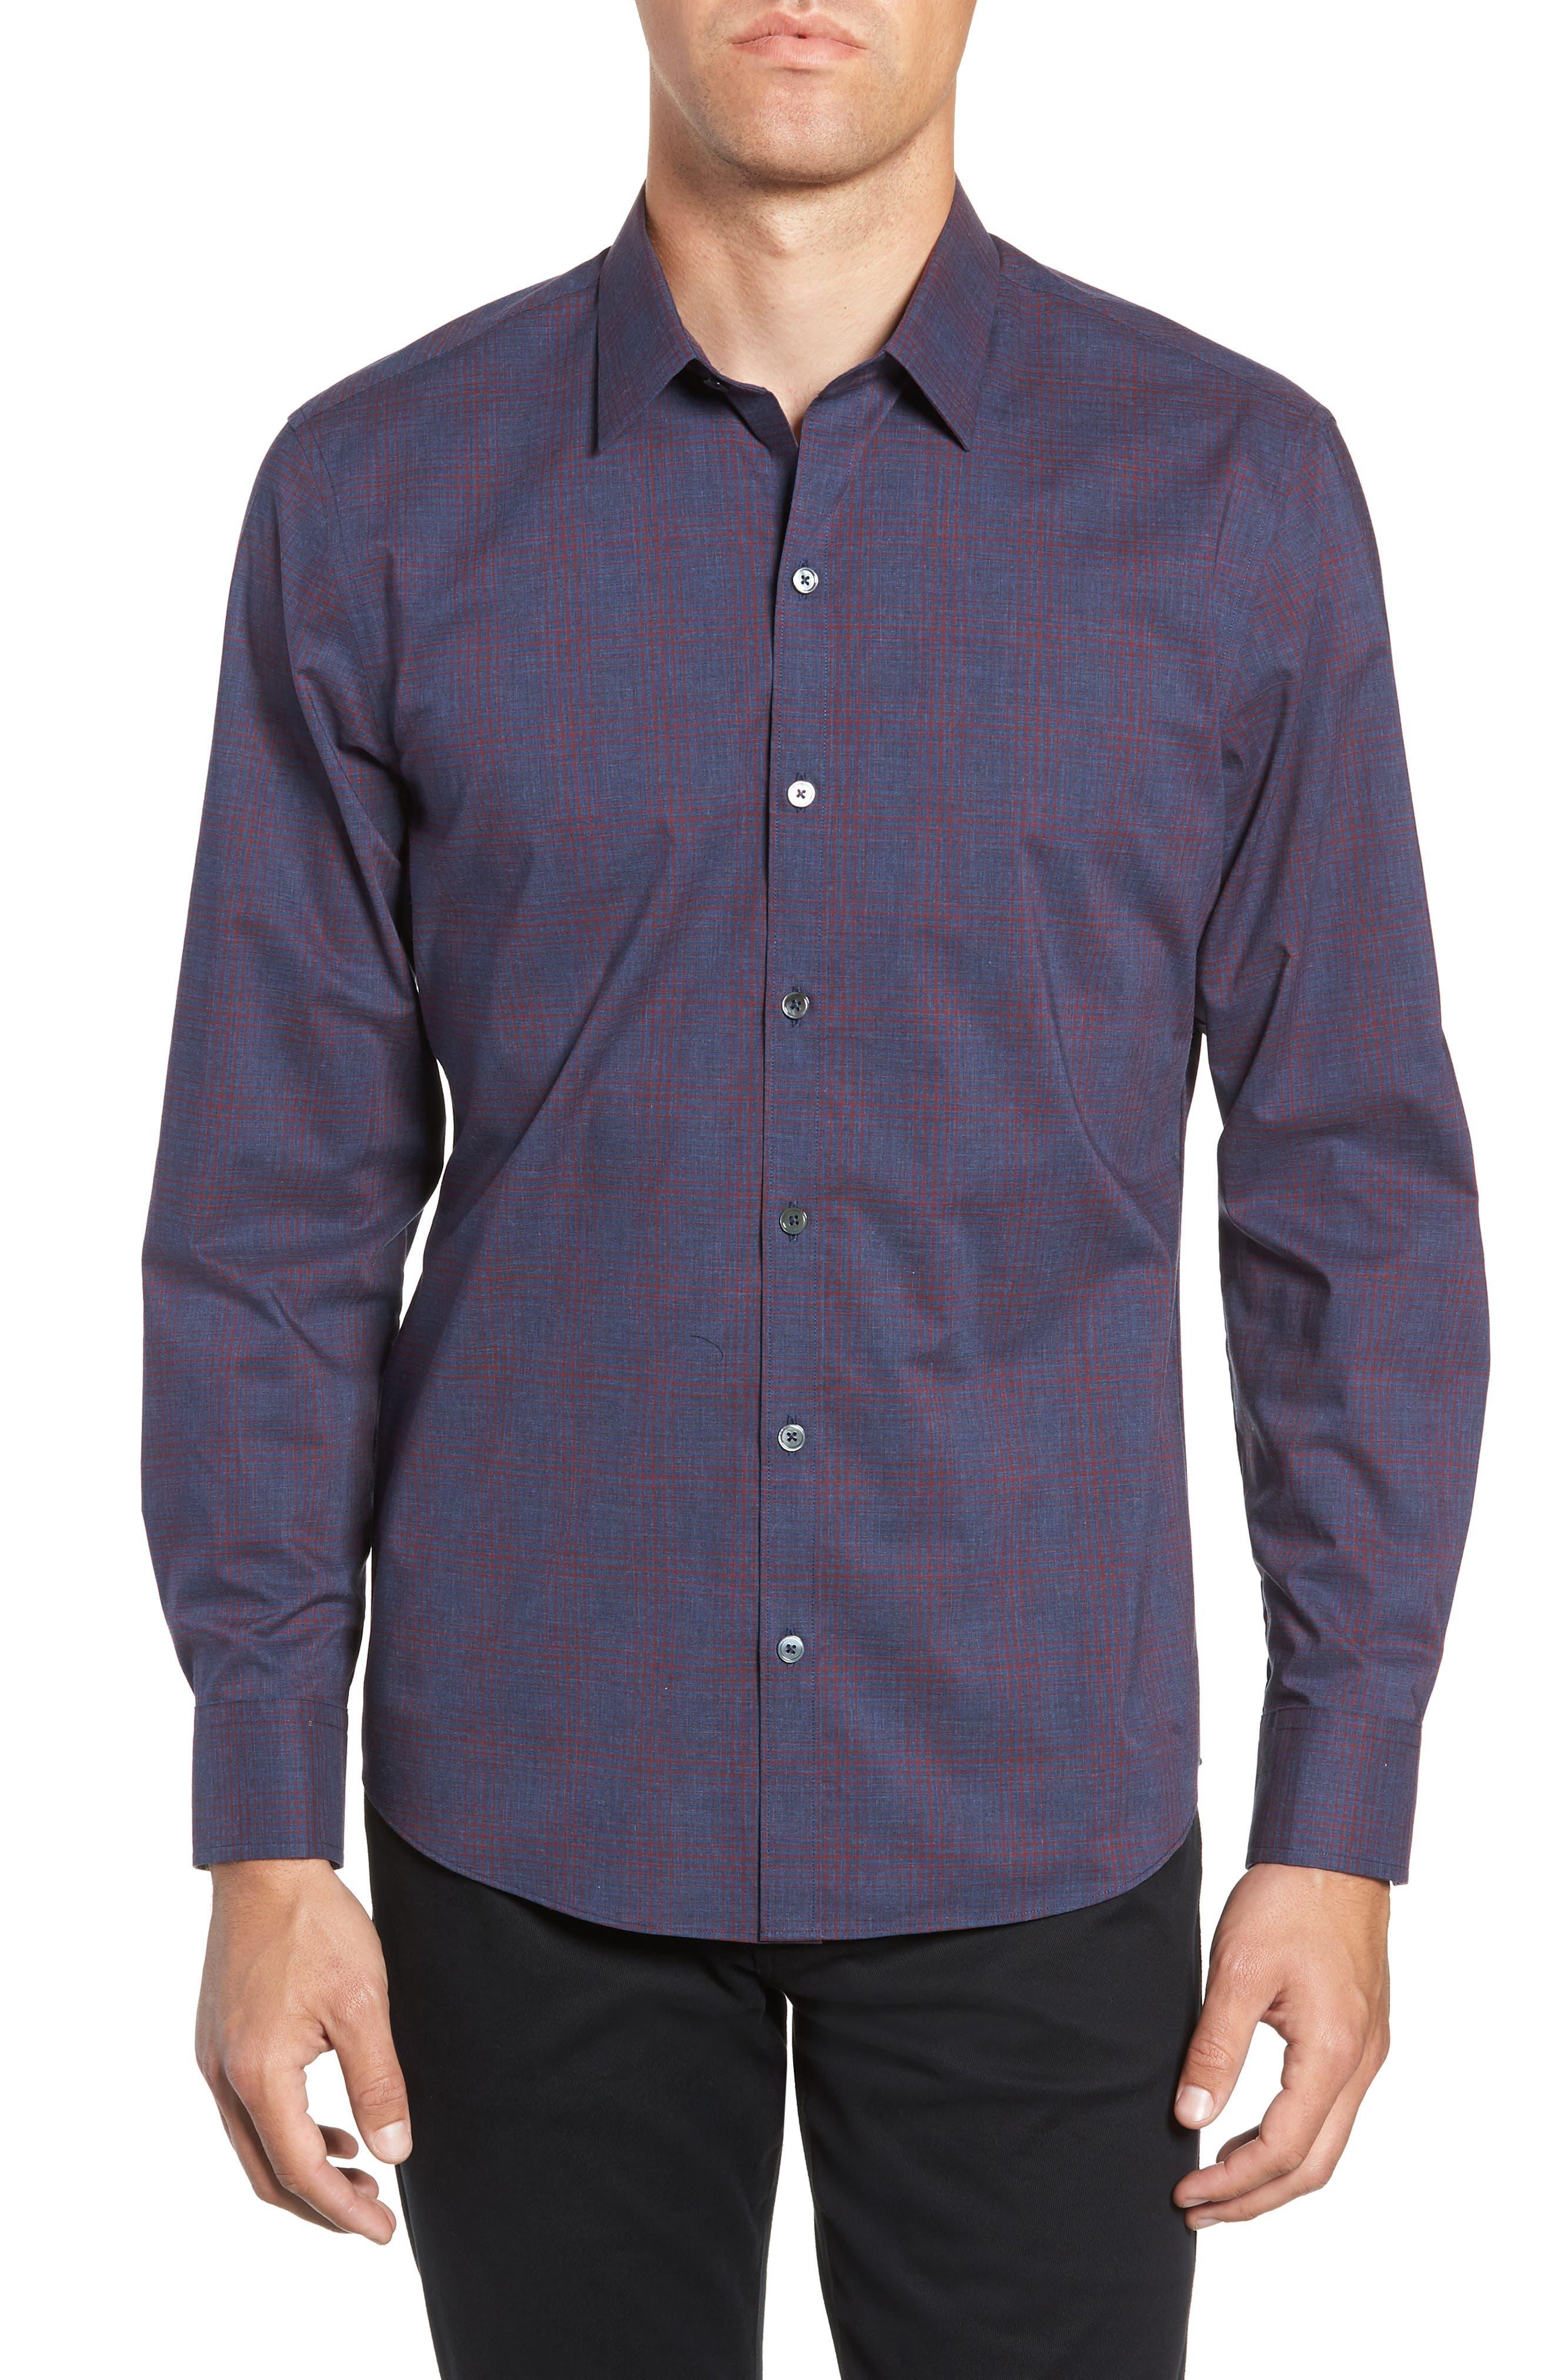 ZACHARY PRELL Maslin Regular Fit Sport Shirt, Main, color, 461